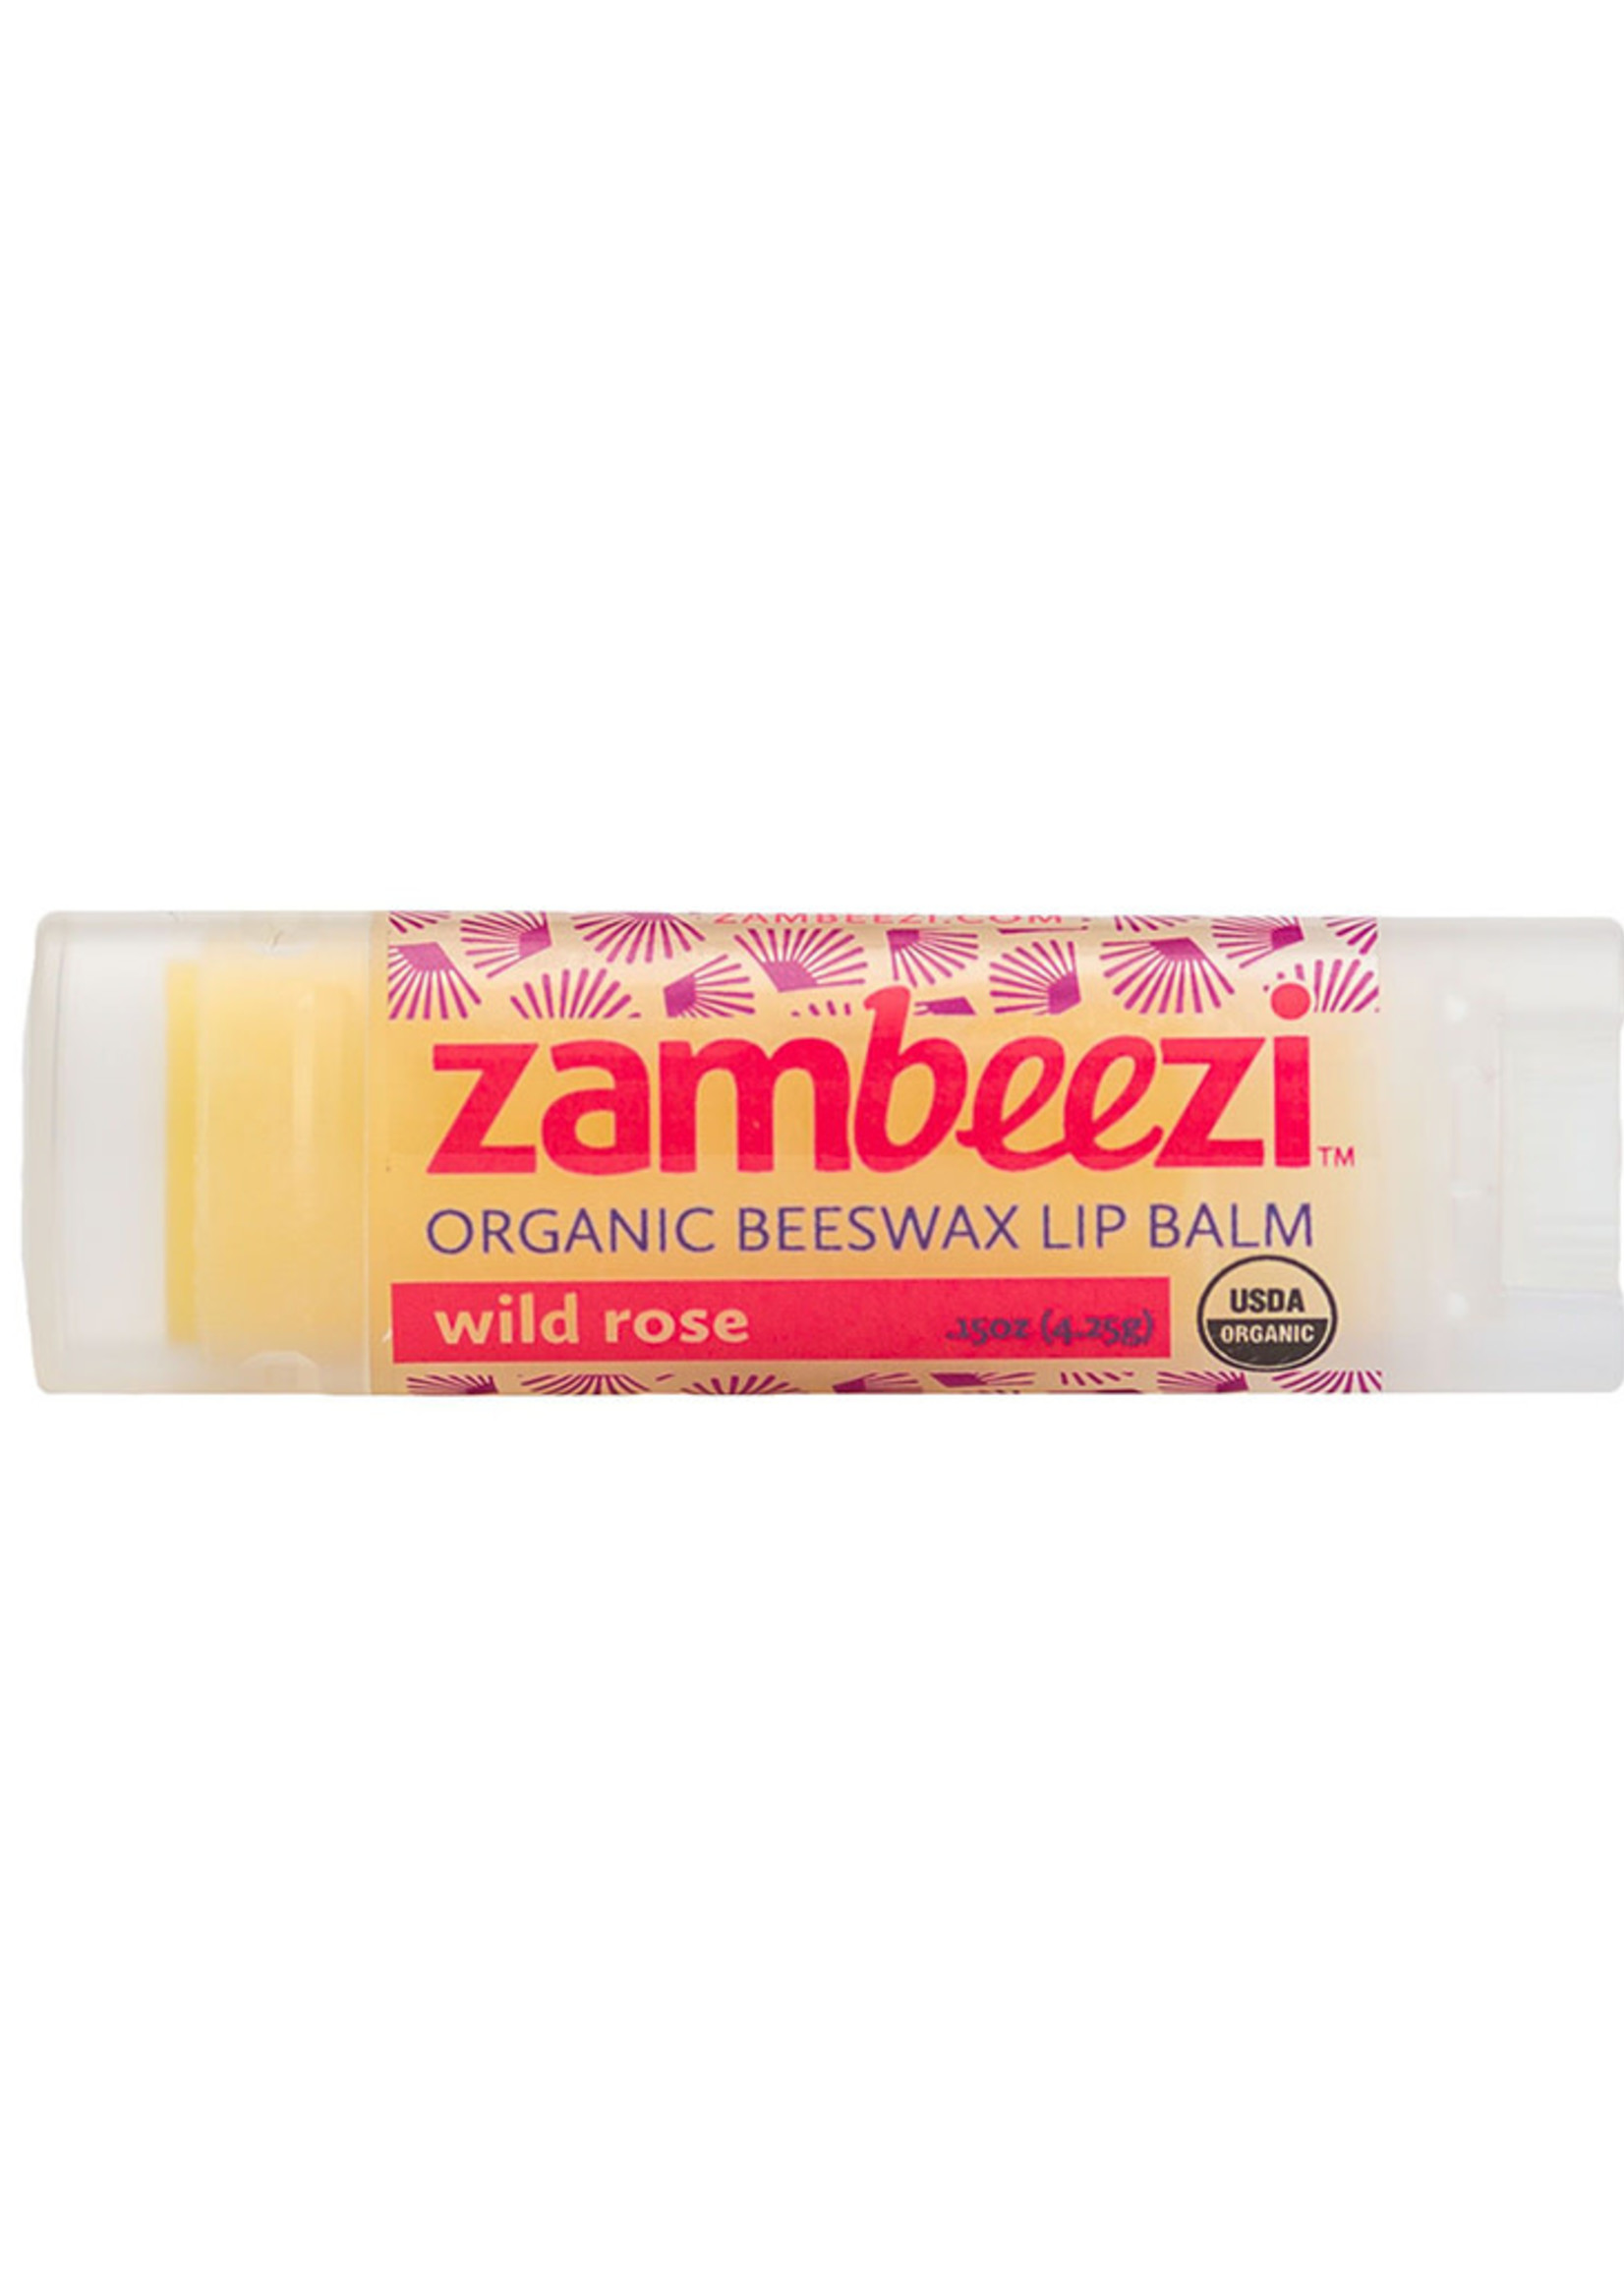 Wild Rose Beeswax Lip Balm